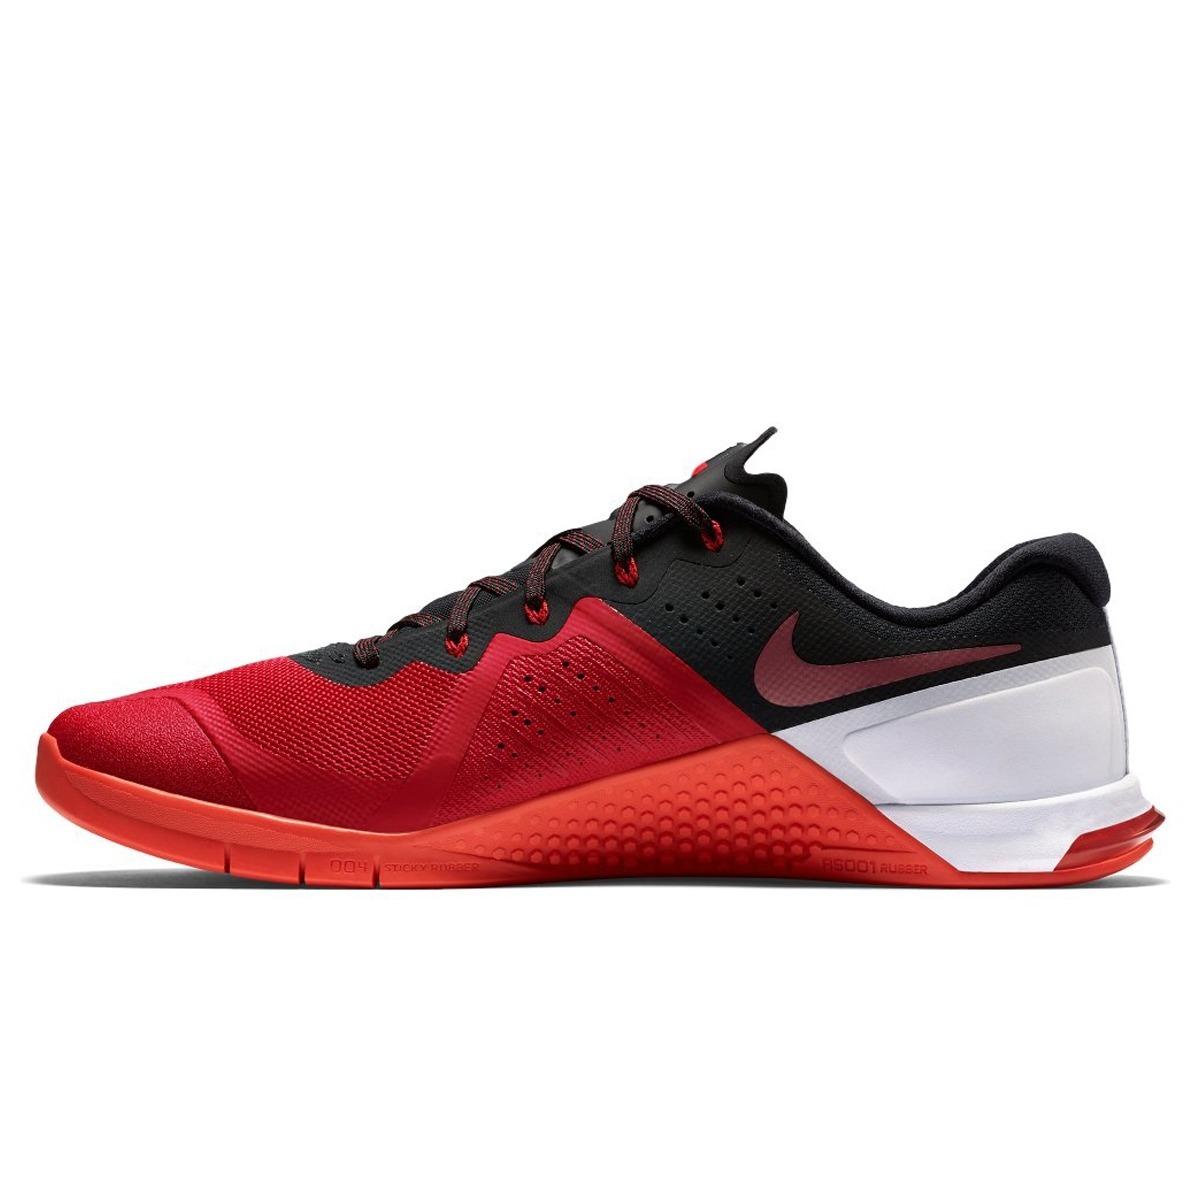 a92b52b75e2 tênis masculino nike metcon 2 nike vermelho preto. Carregando zoom... tênis  masculino nike nike. Carregando zoom.